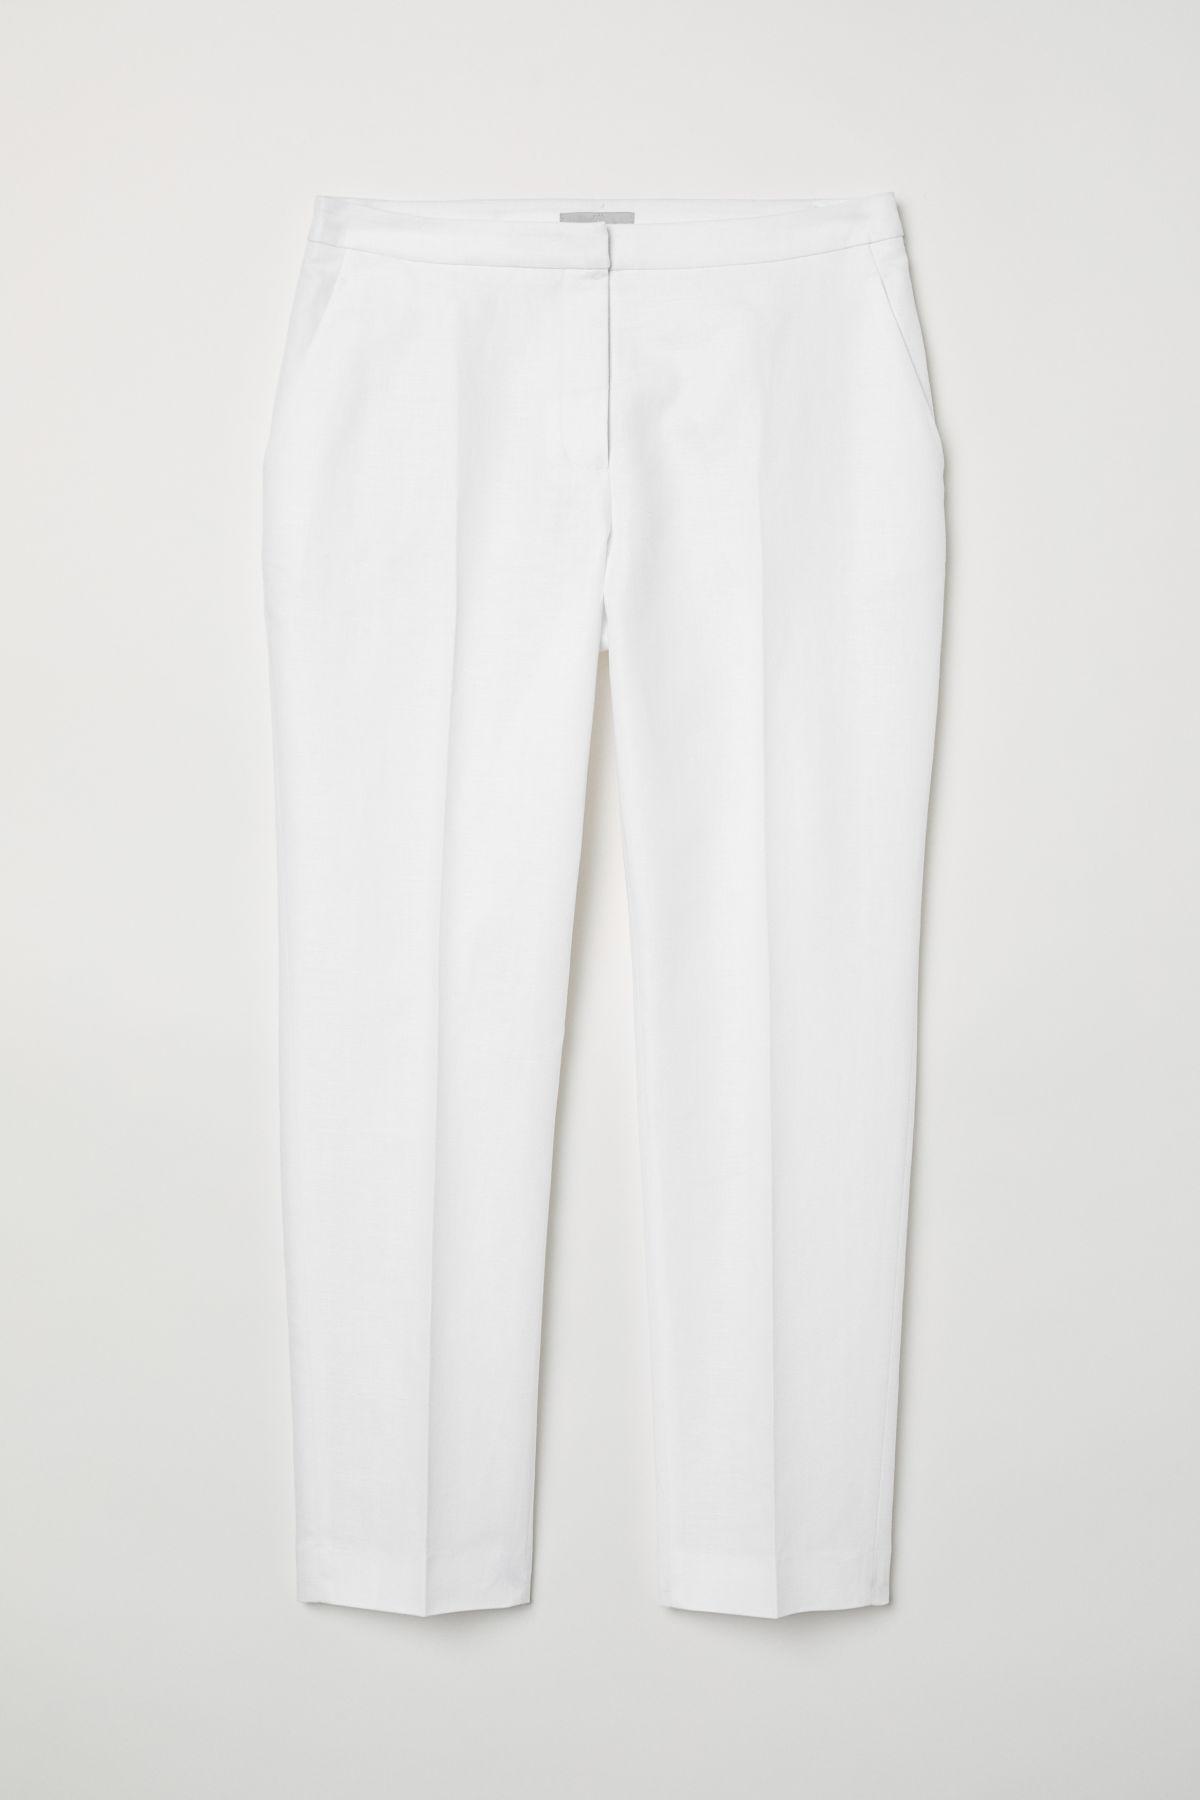 H&M, Zara and Mango Sale Picks: Basics Edition